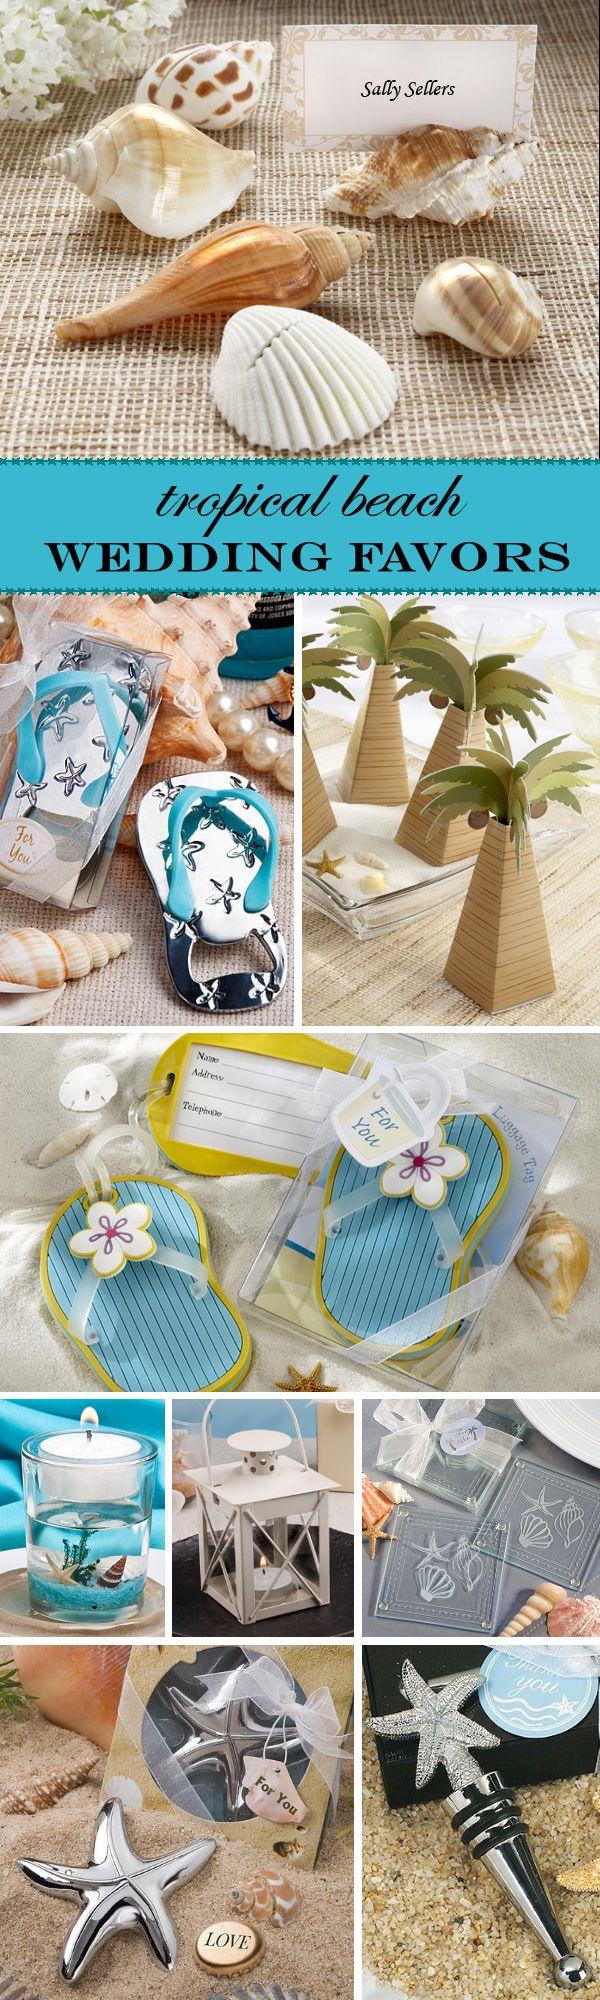 Amazing Tropical & Beach Themed Wedding Favor Ideas - love the flip flop luggage tags!